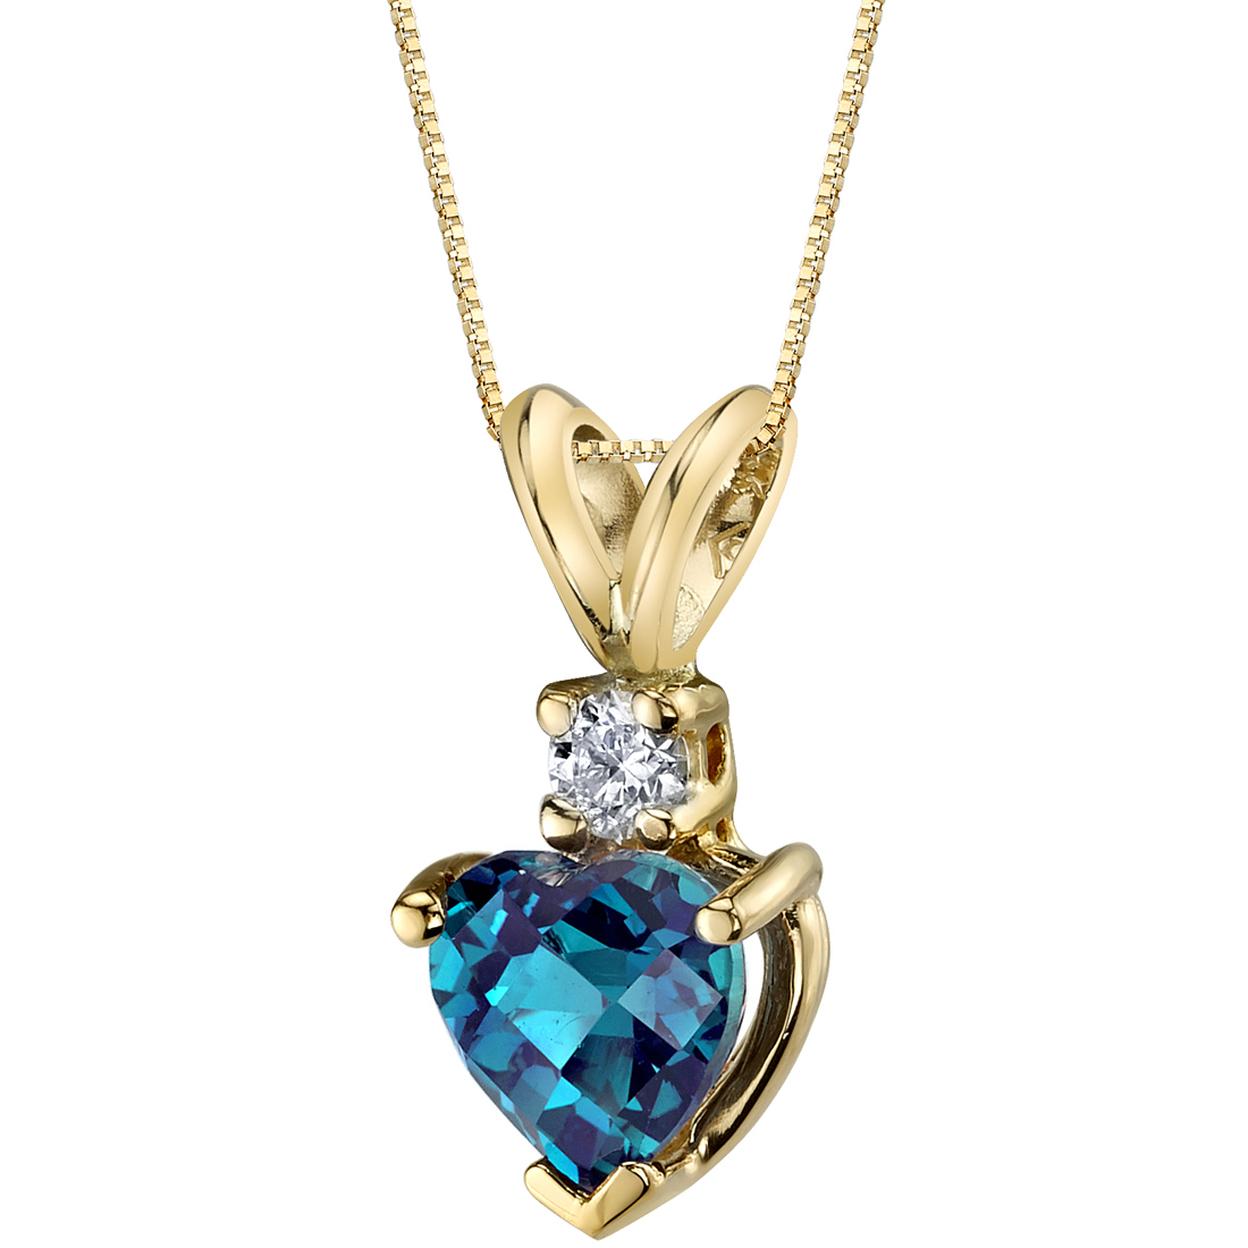 Oravo 14 Karat Yellow Gold Heart Shape 1.00 Carats Created Alexandrite Diamond Pendant